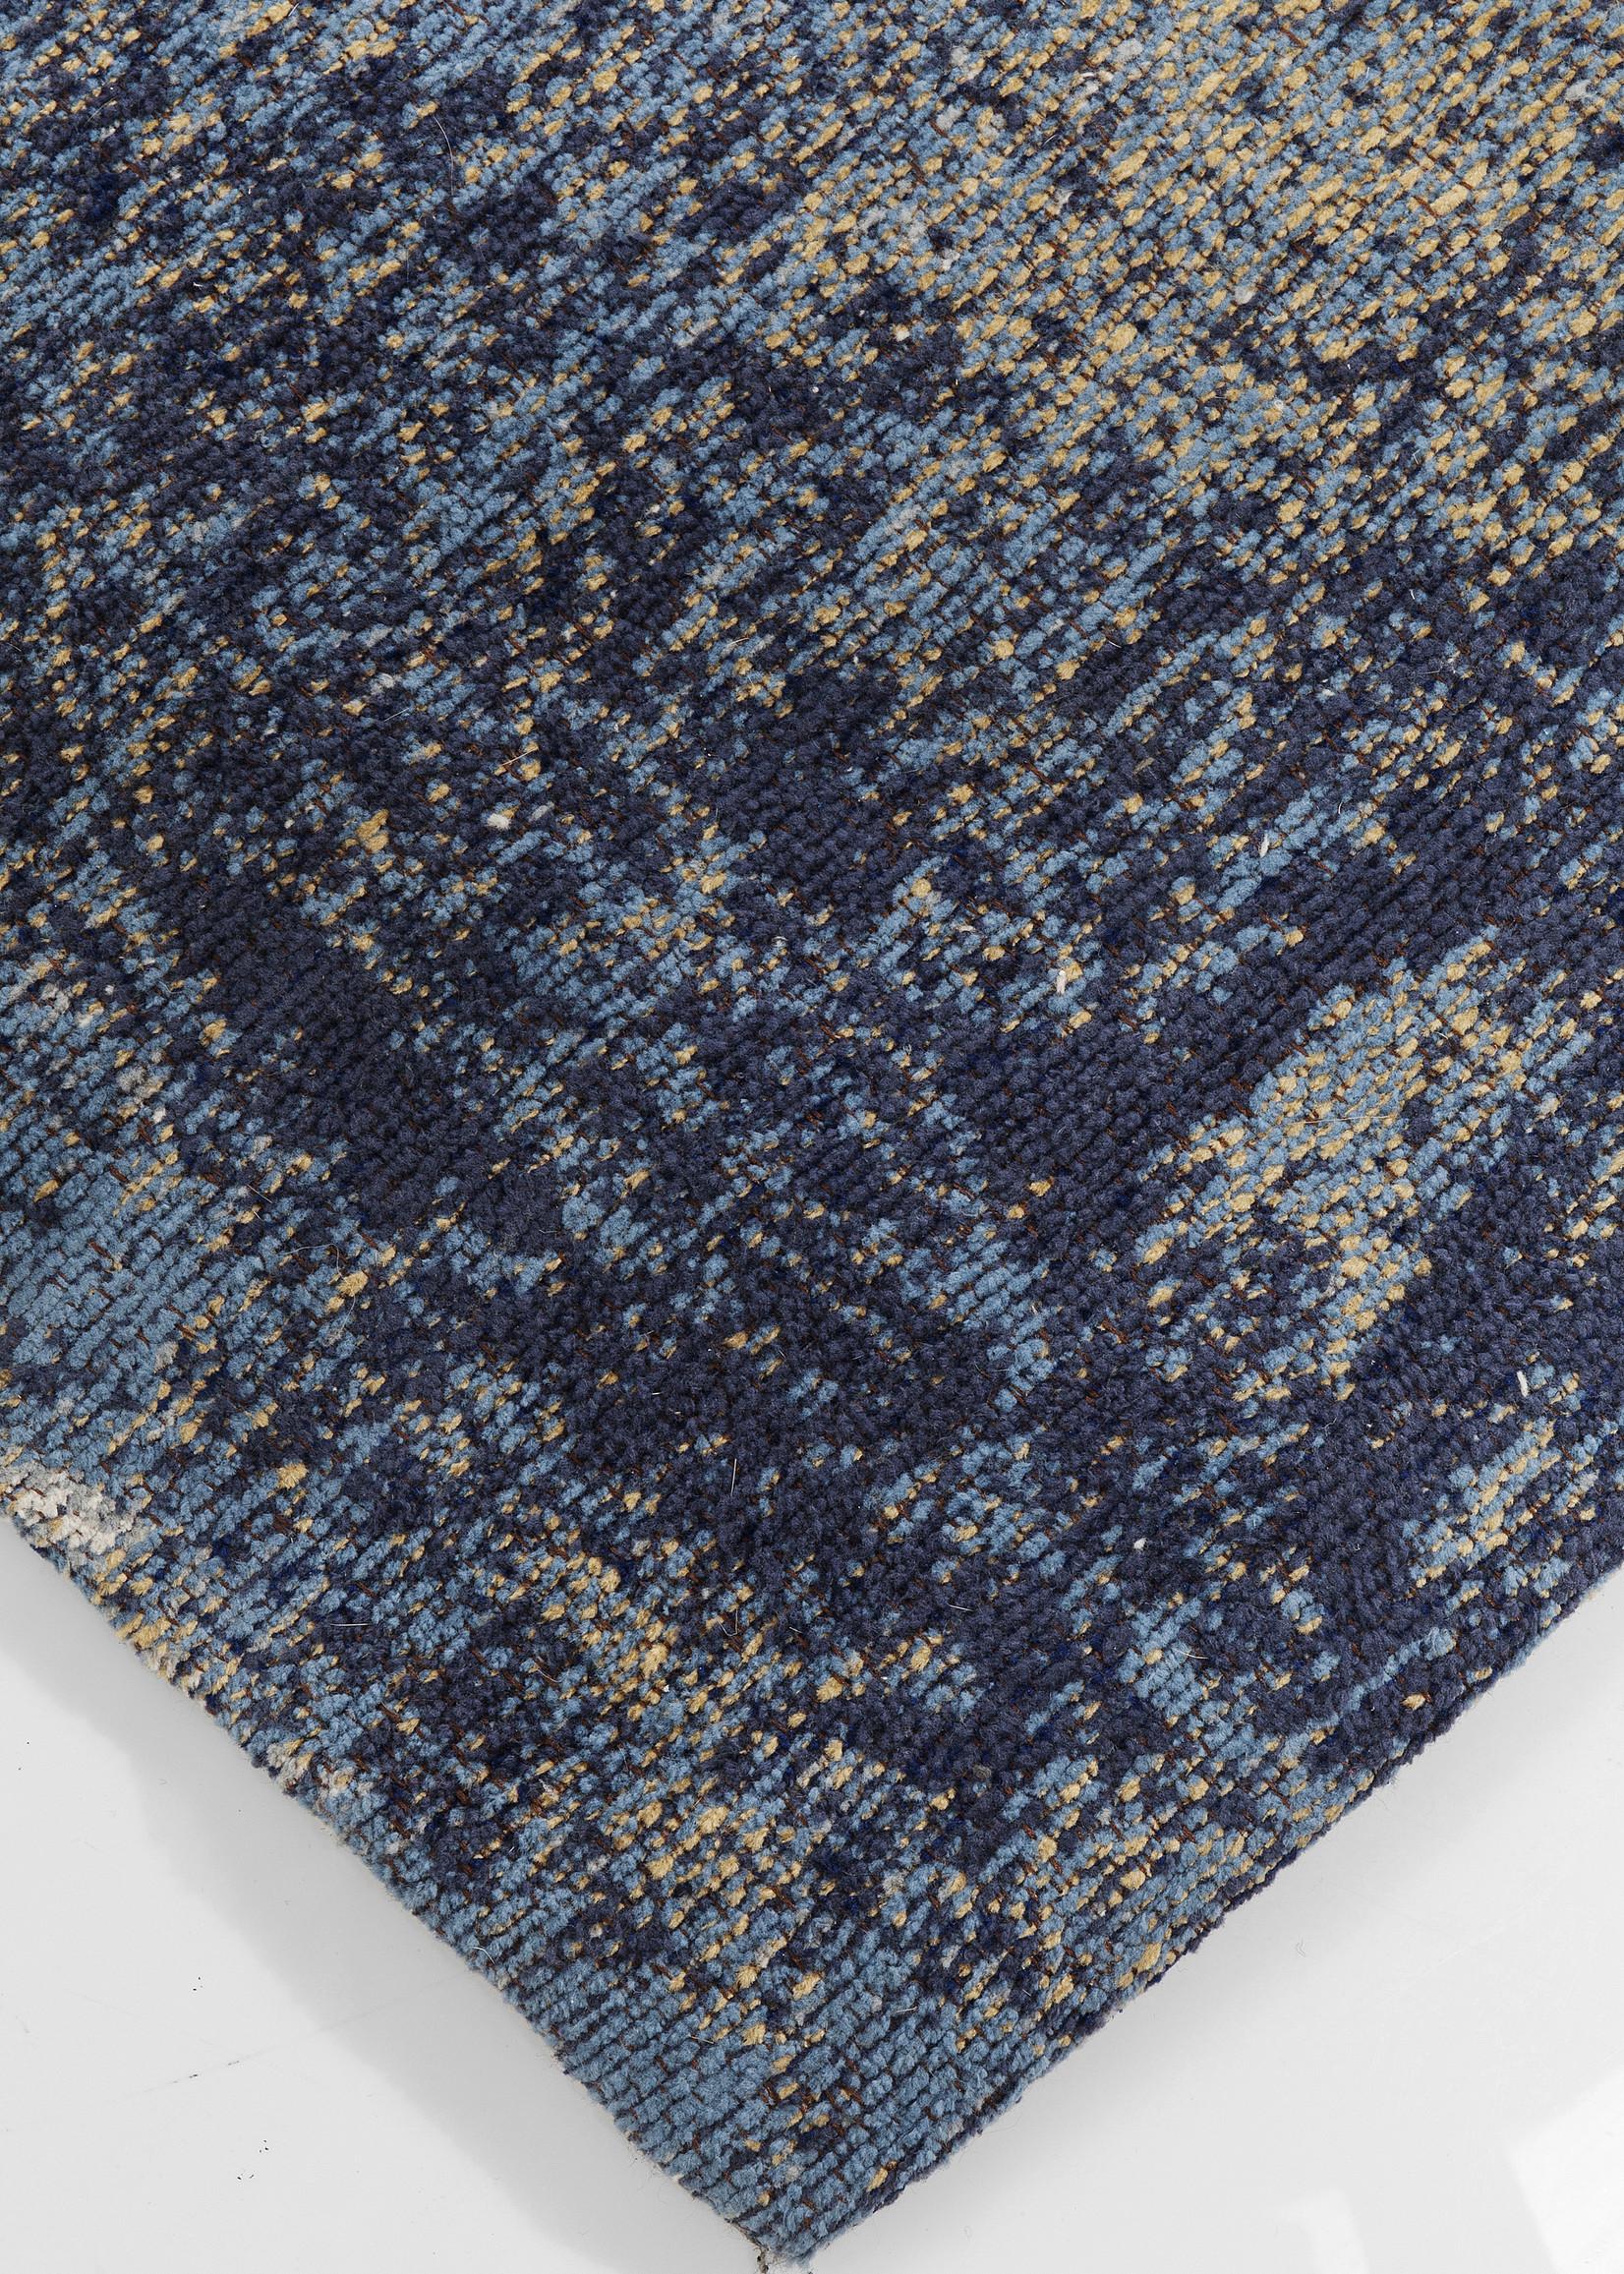 KARE DESIGN Carpet Abstract Dark Blue 240x170cm